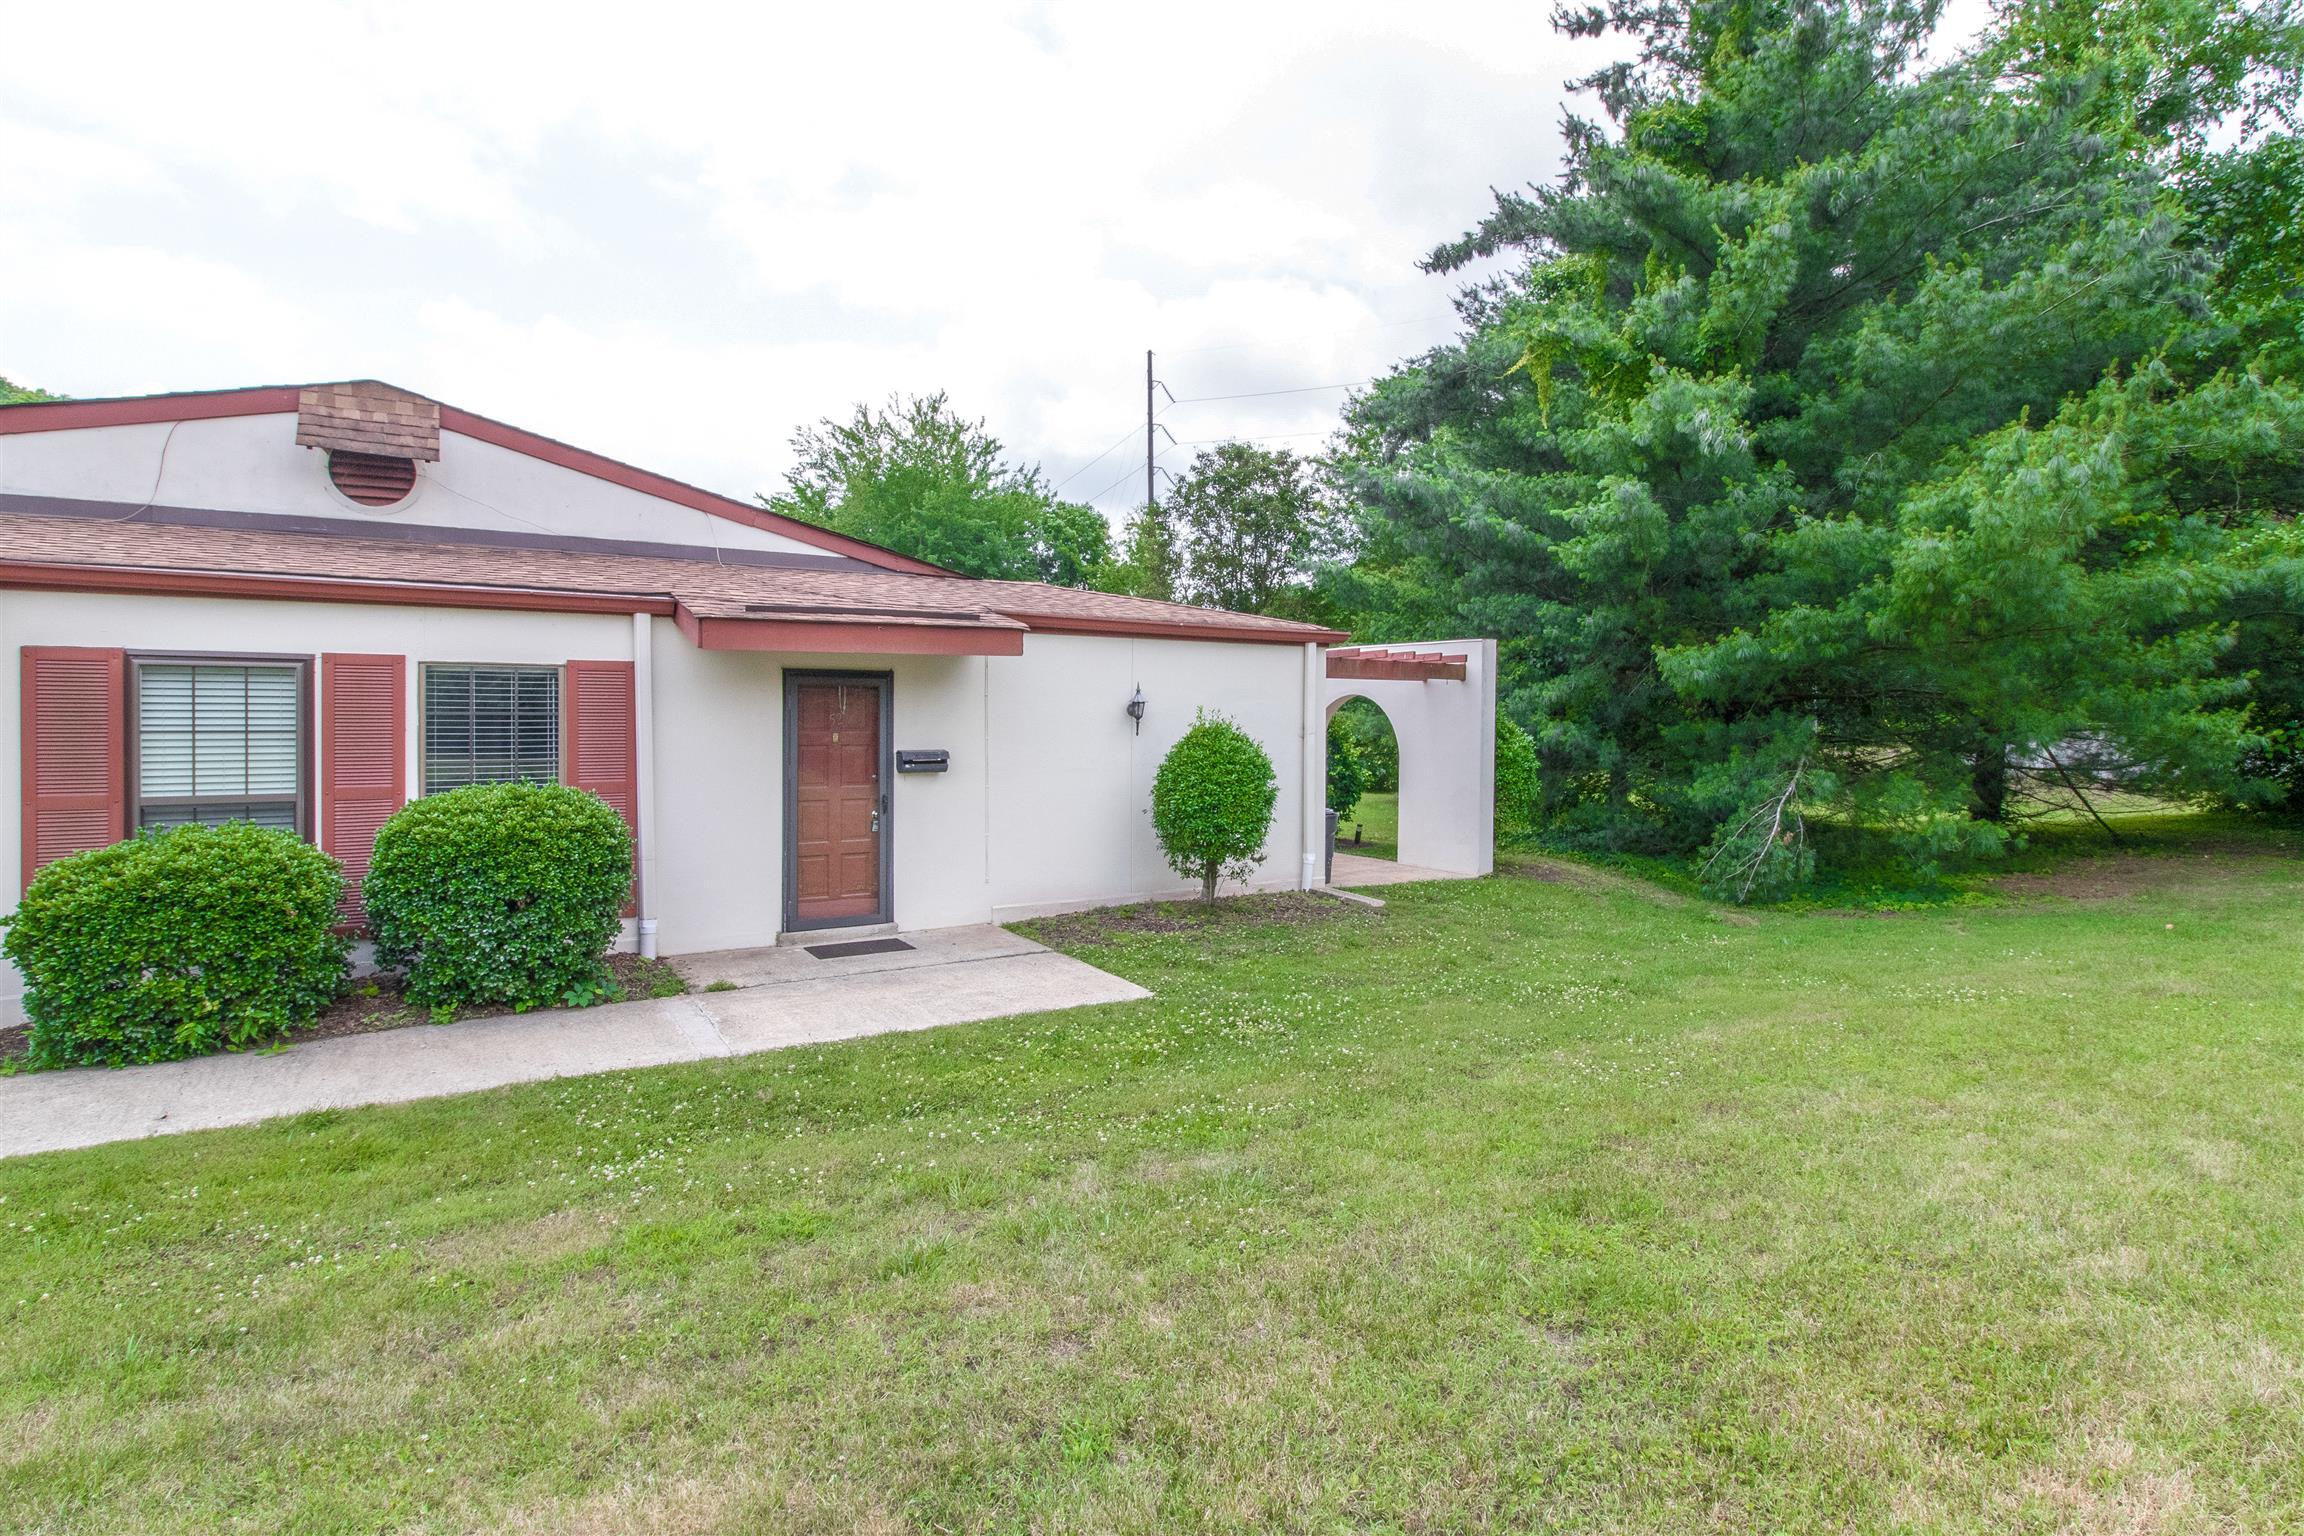 210 Old Hickory Blvd #52, Nashville, TN 37221 - Nashville, TN real estate listing